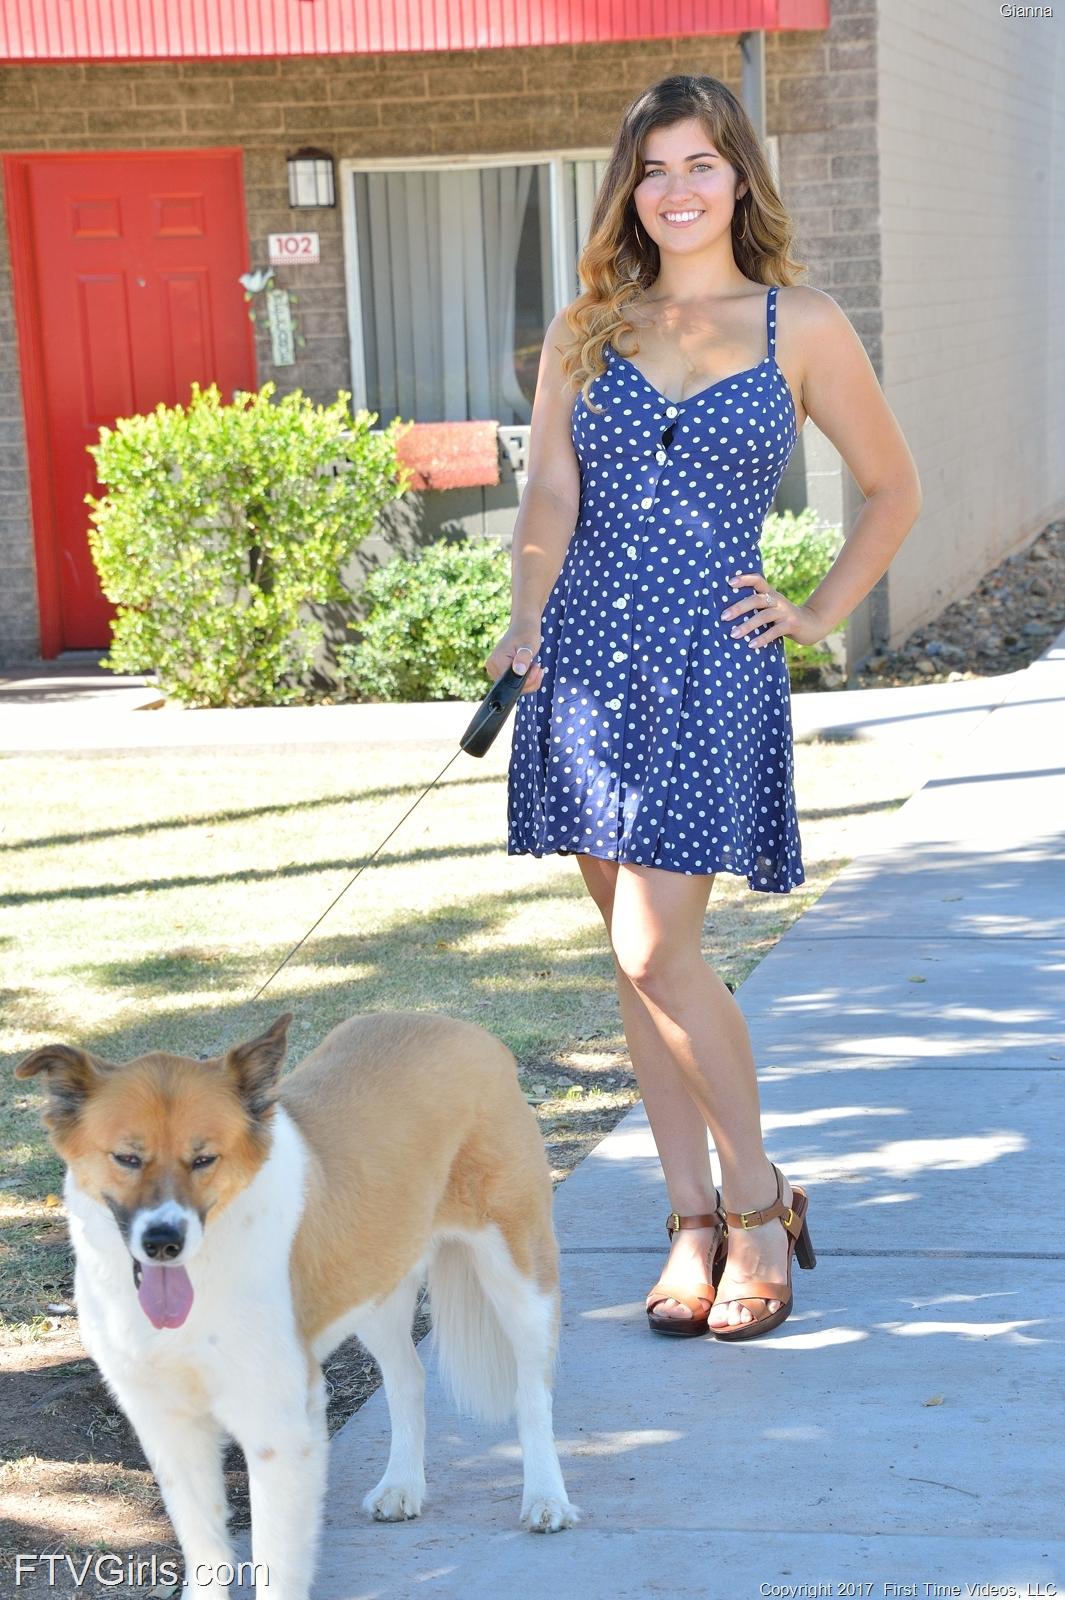 FTV Girls Gianna Pretty Dog Walker - FTVGirls.com